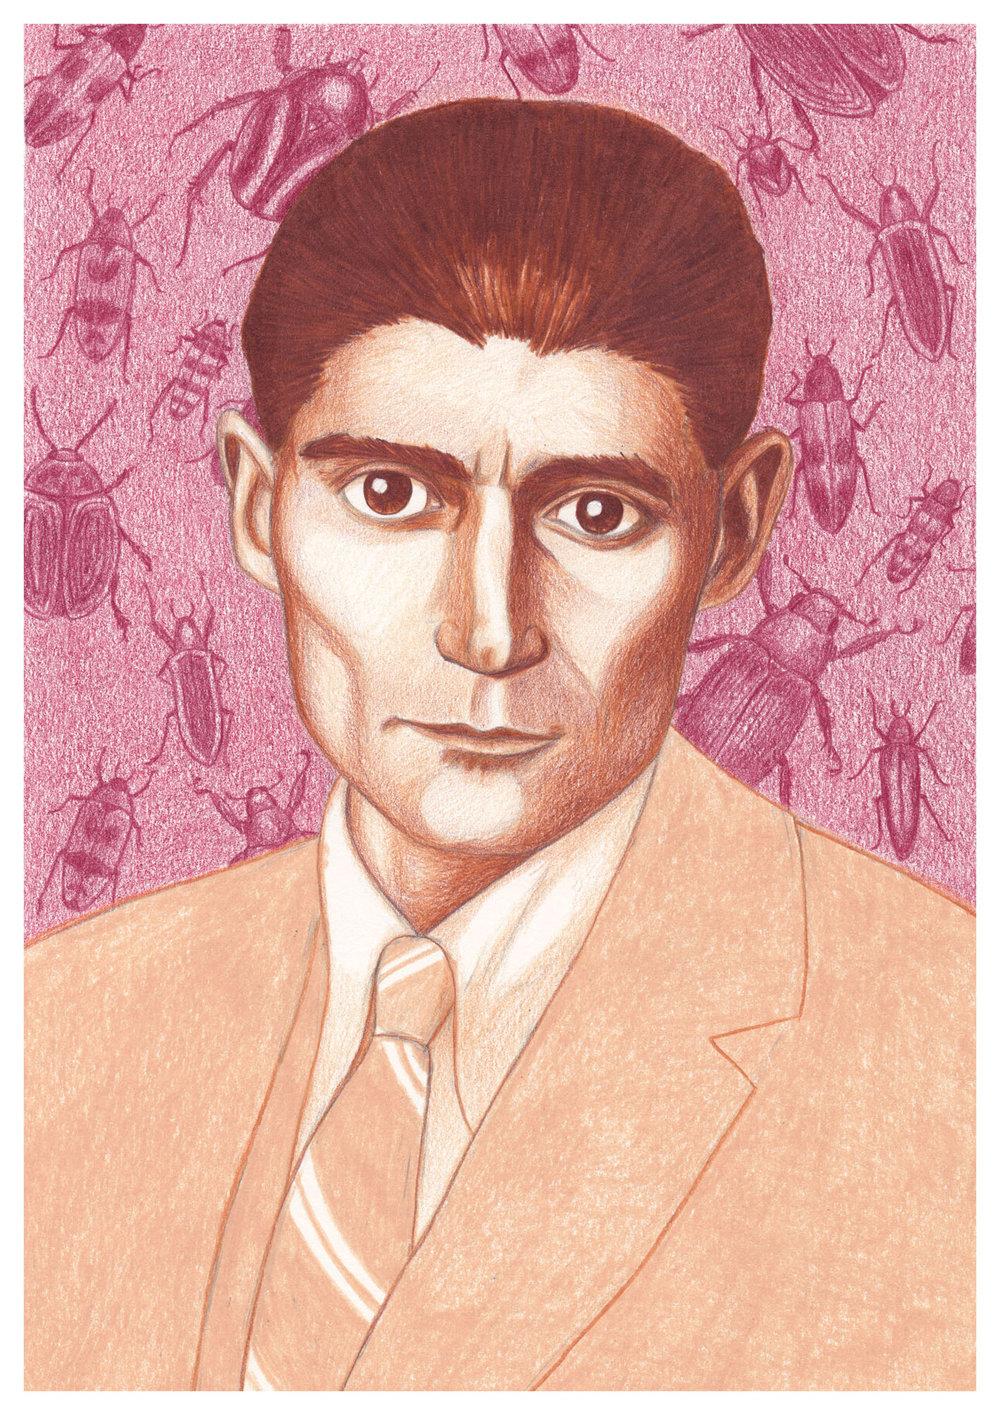 my finished illustration of Franz Kafka